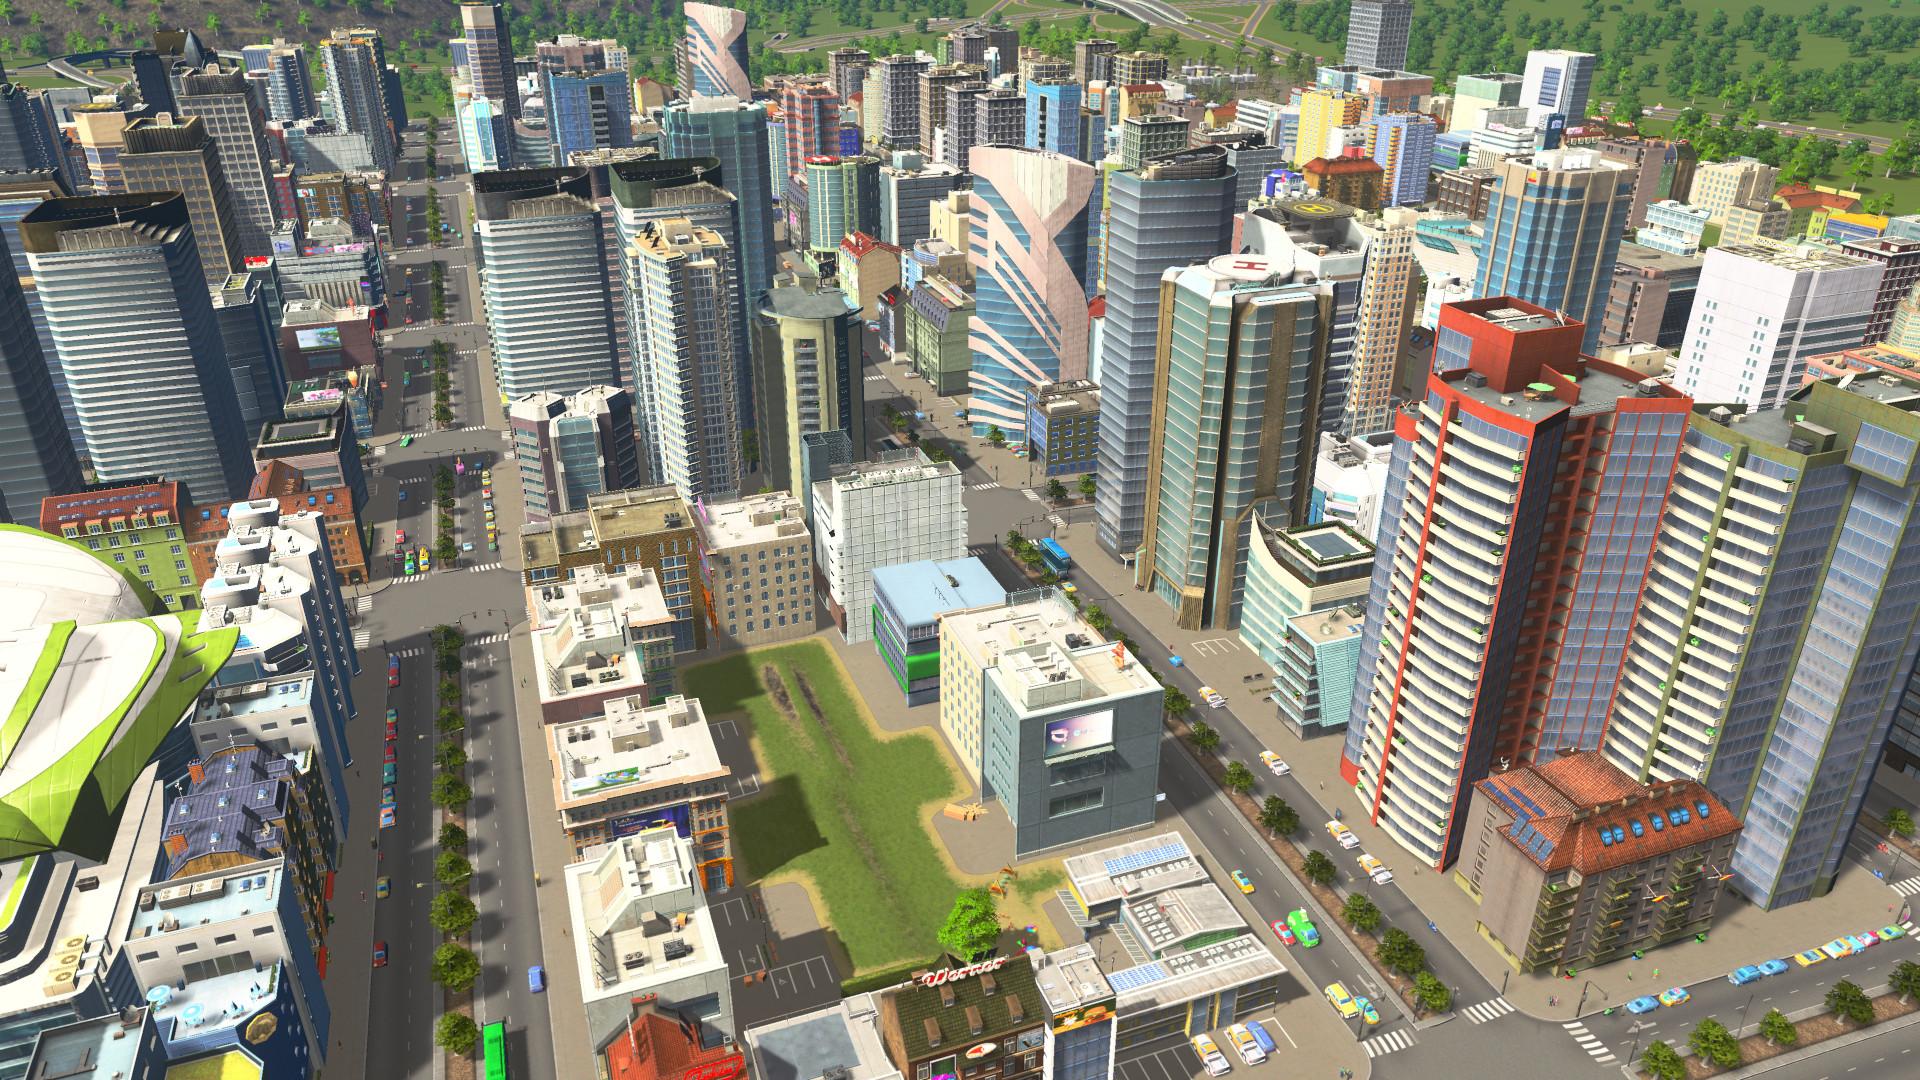 cities skylines gratuit sur steam1